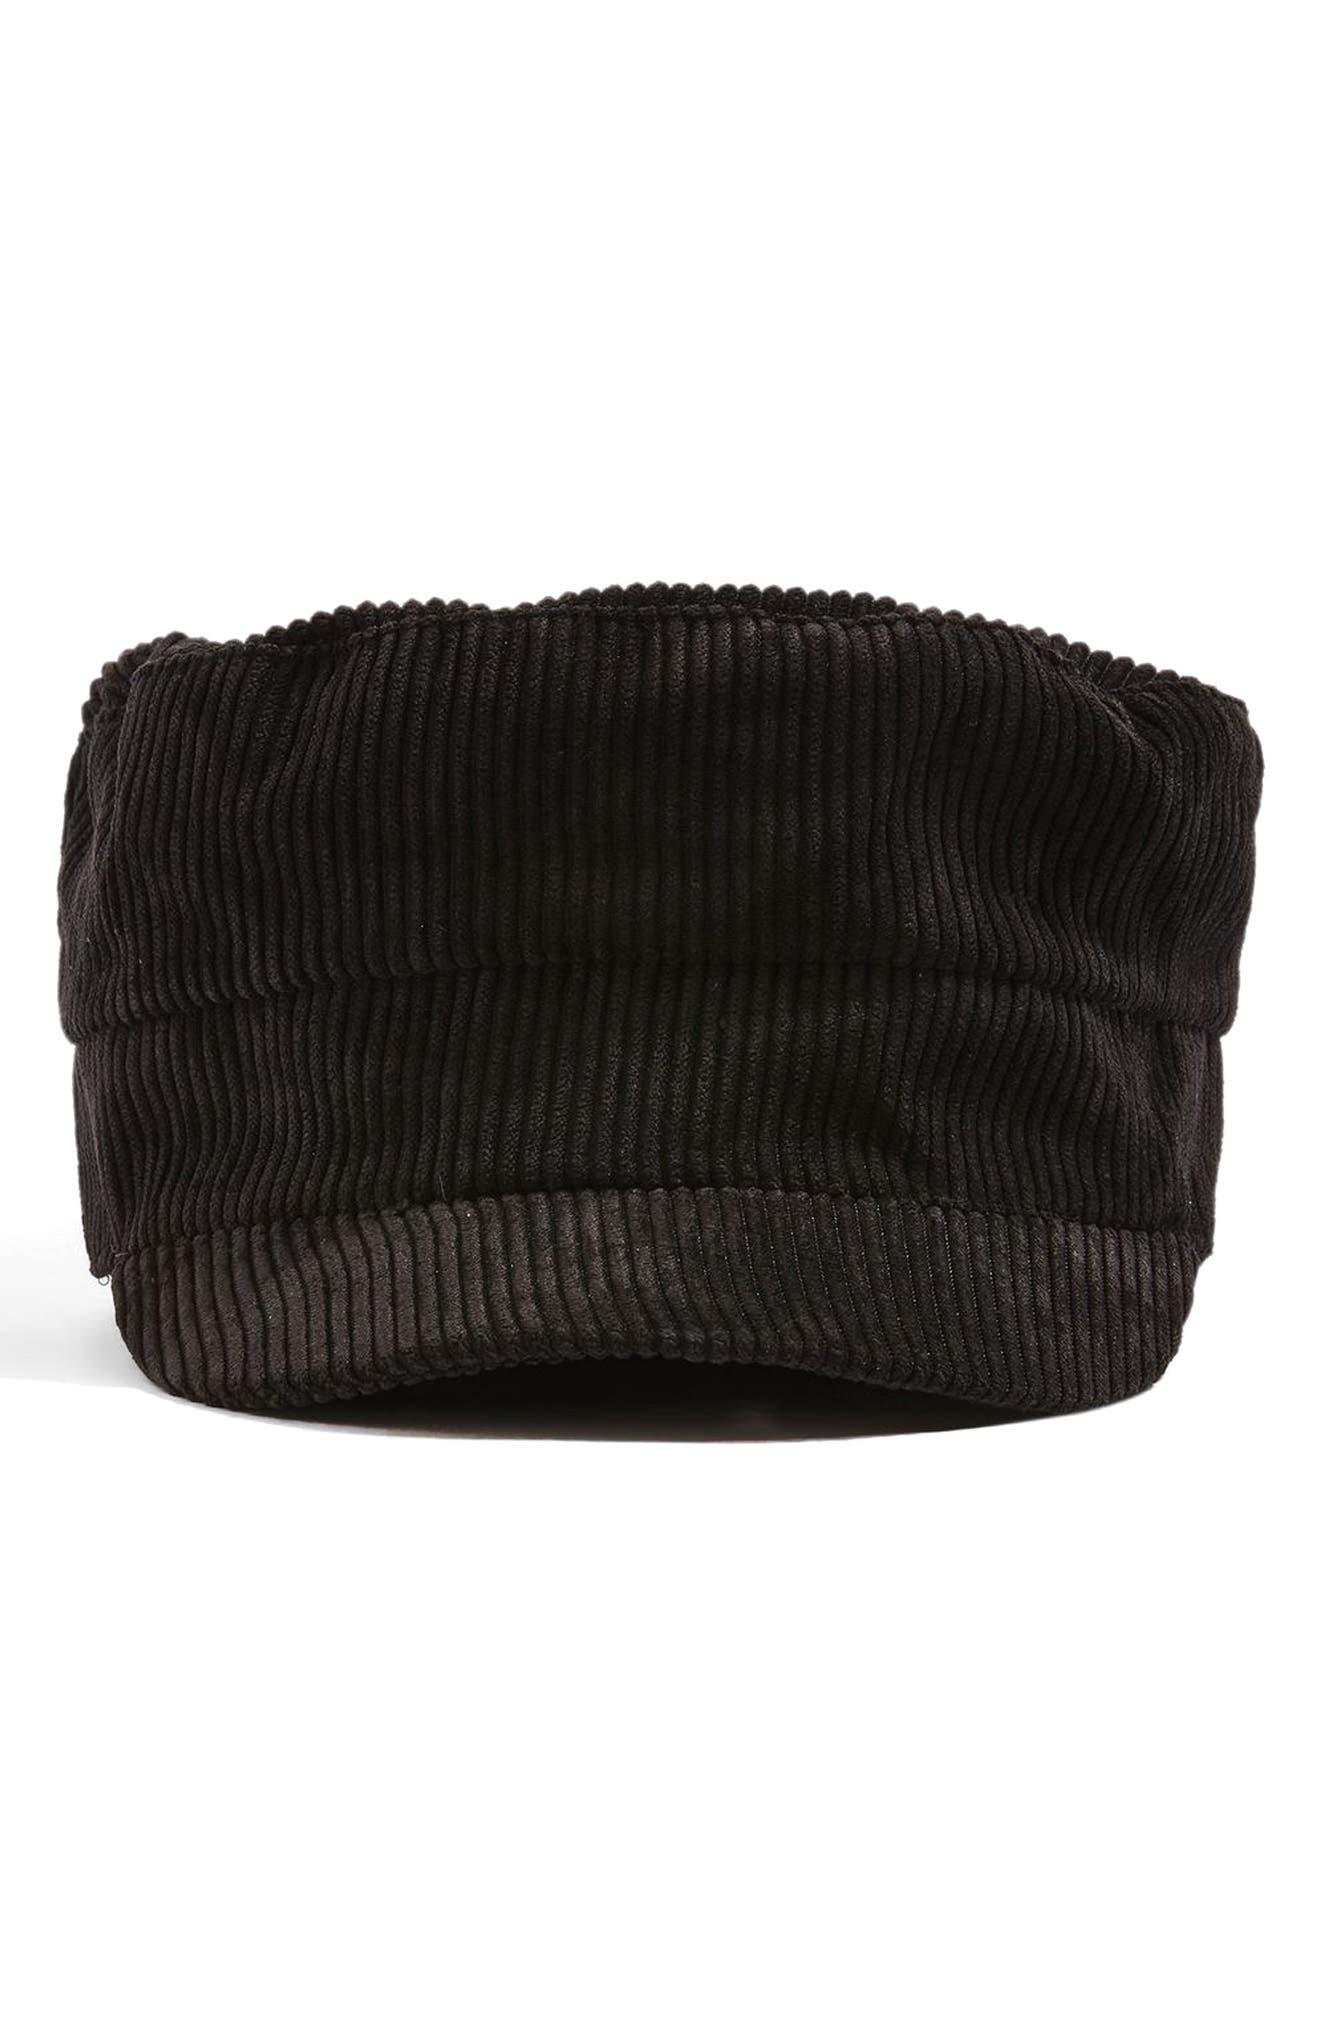 Main Image - Topshop Corduroy Baker Boy Hat